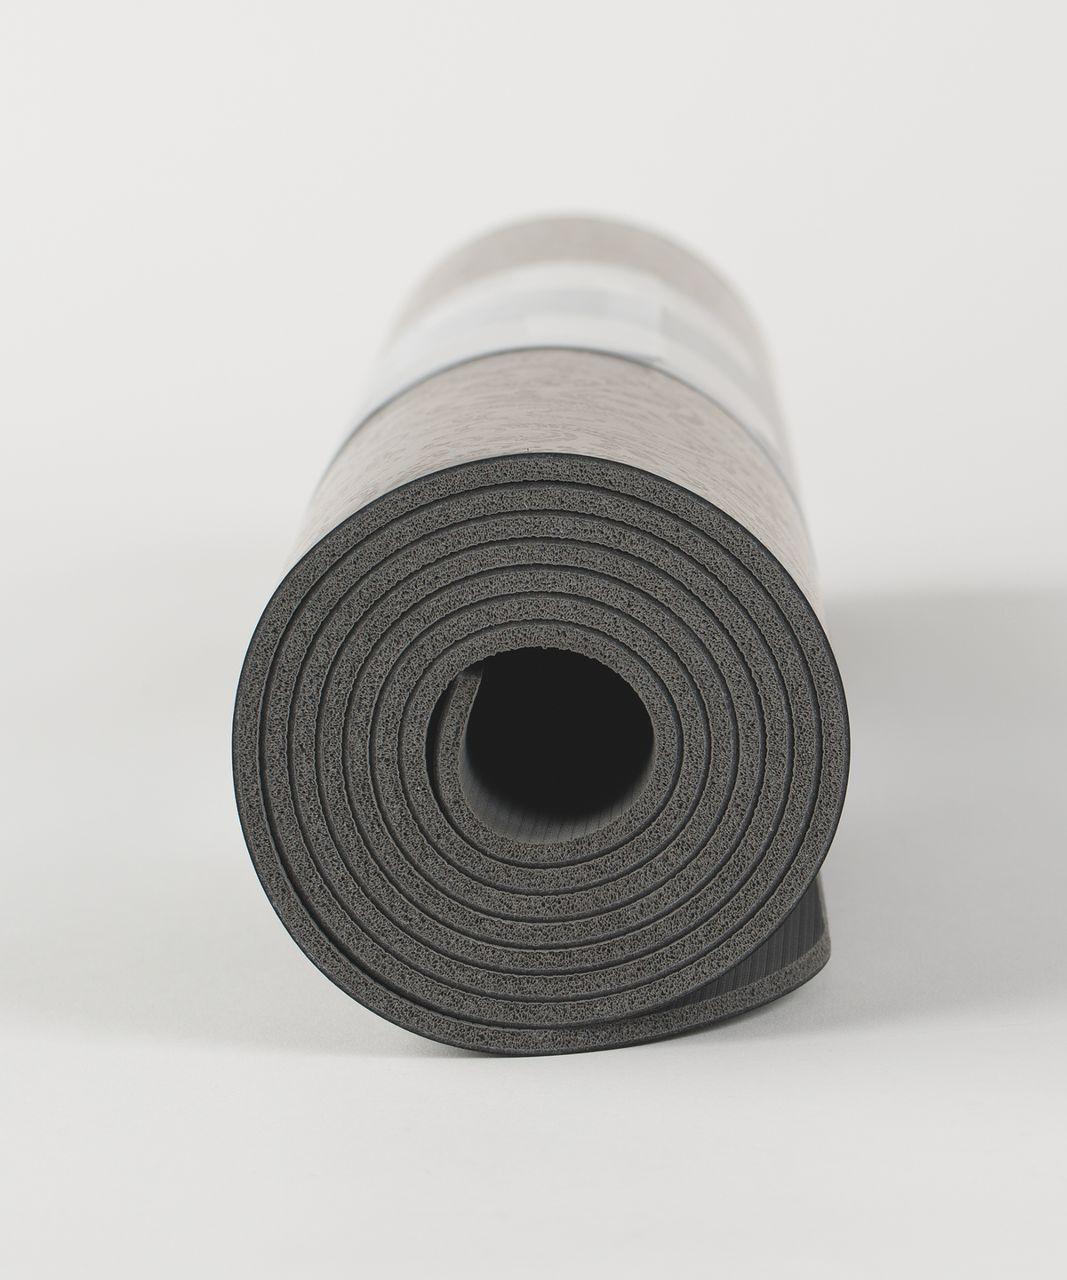 Lululemon The Reversible Mat 5mm - Maxi Foli Manifesto Black Deep Coal / Soot Light